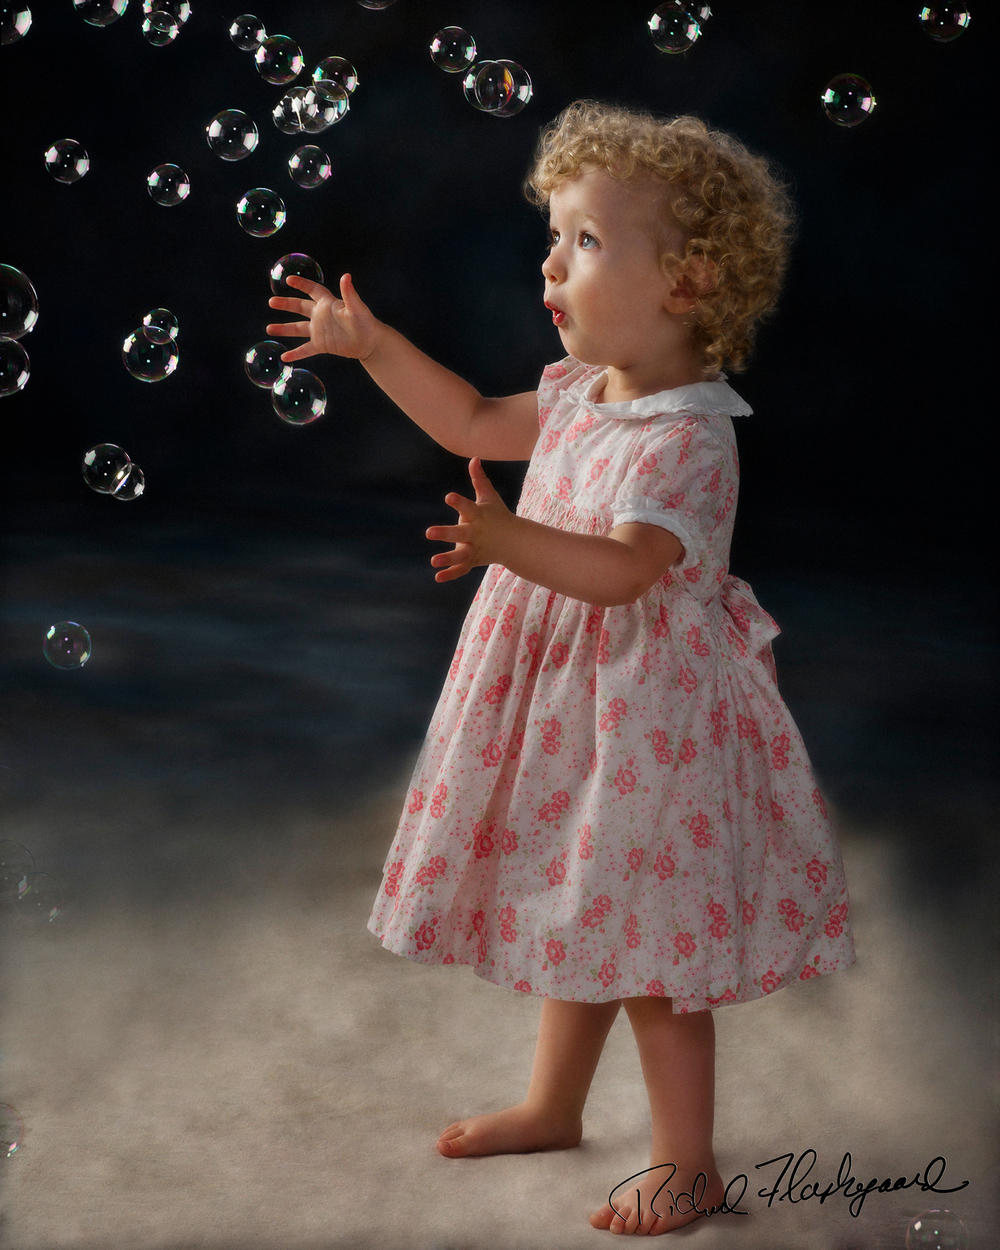 children's photographer, girl, photography, photographer, greenwich, darien, norwalk, stamford, rye, white plains